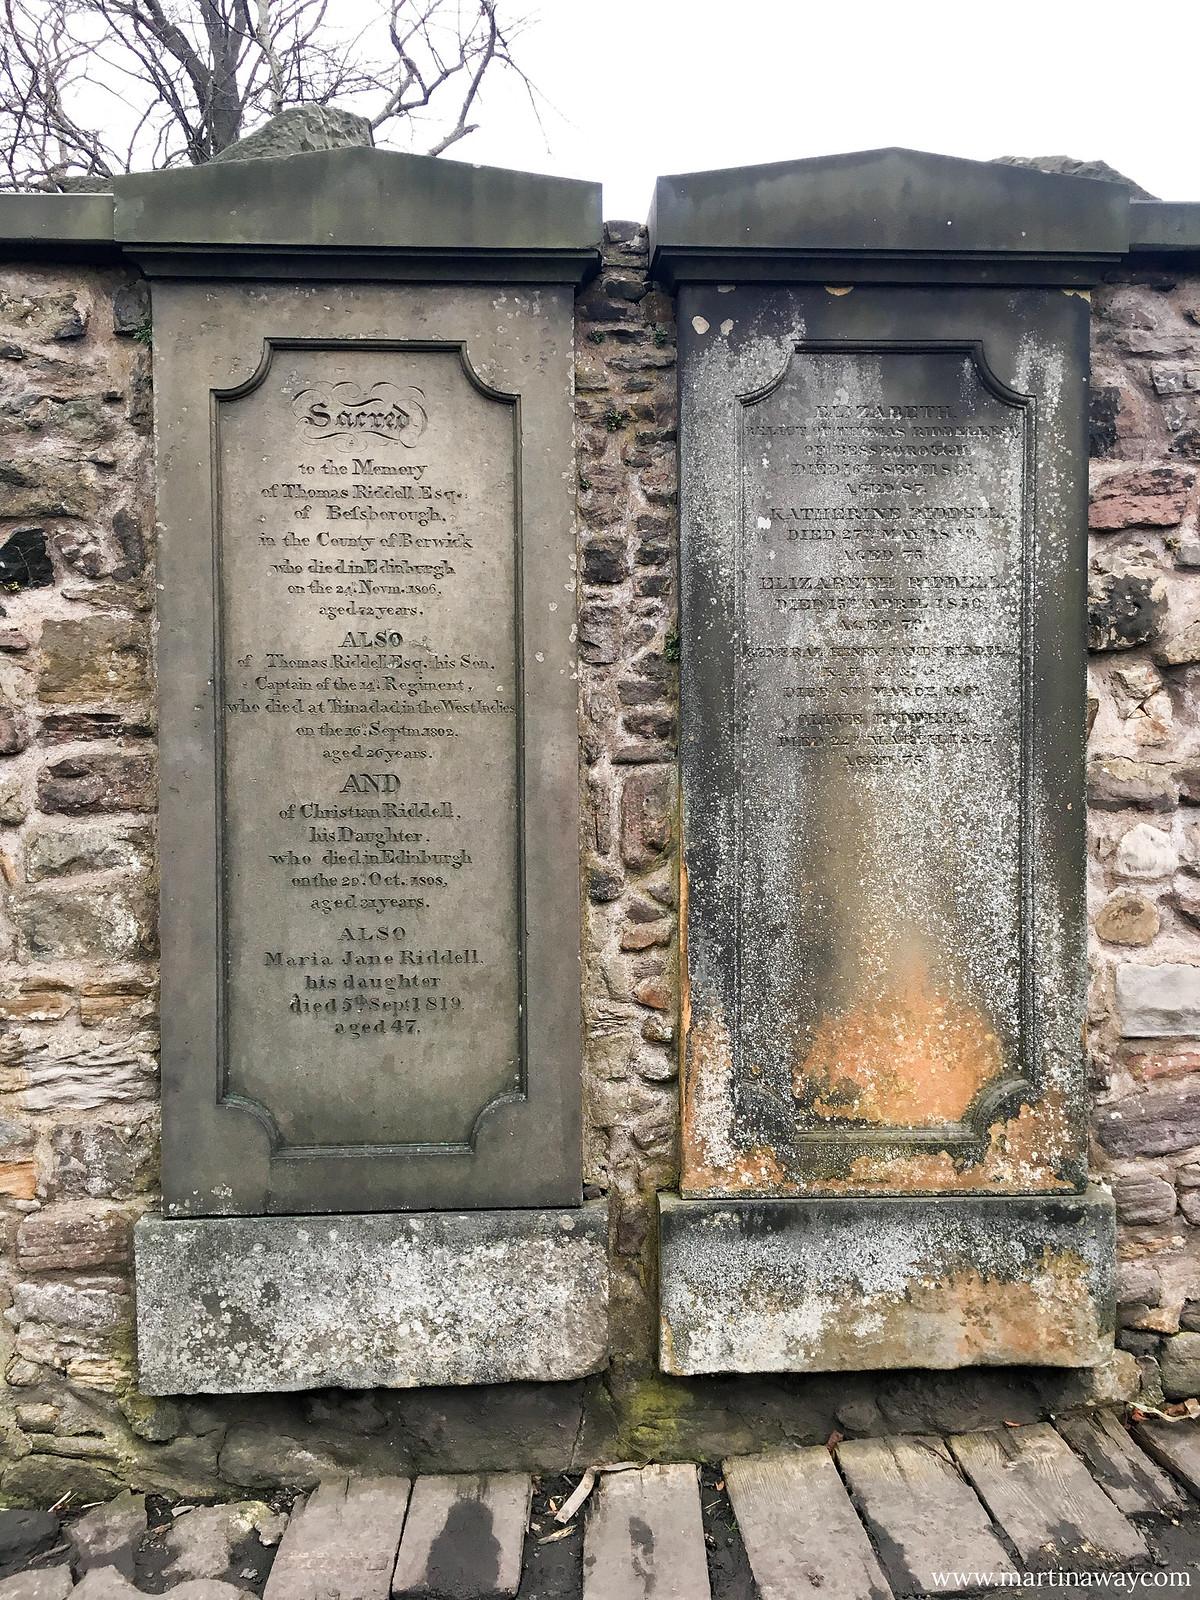 Tomba di Thomas Riddle